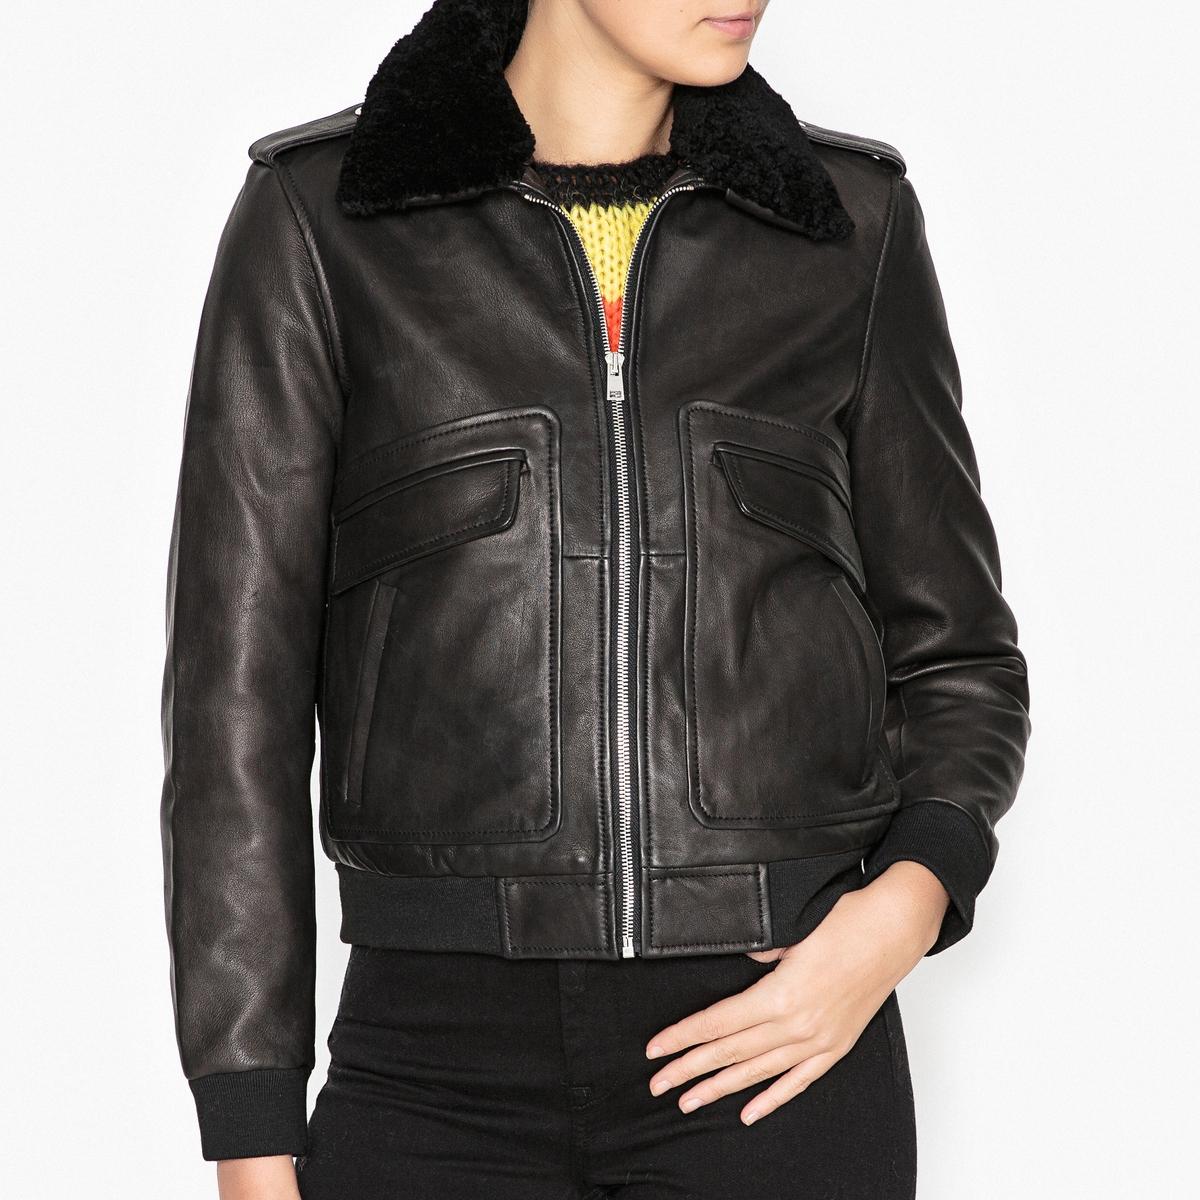 Блузон кожаный на молнии в стиле летчика JOSH блузон кожаный на молнии в стиле летчика josh